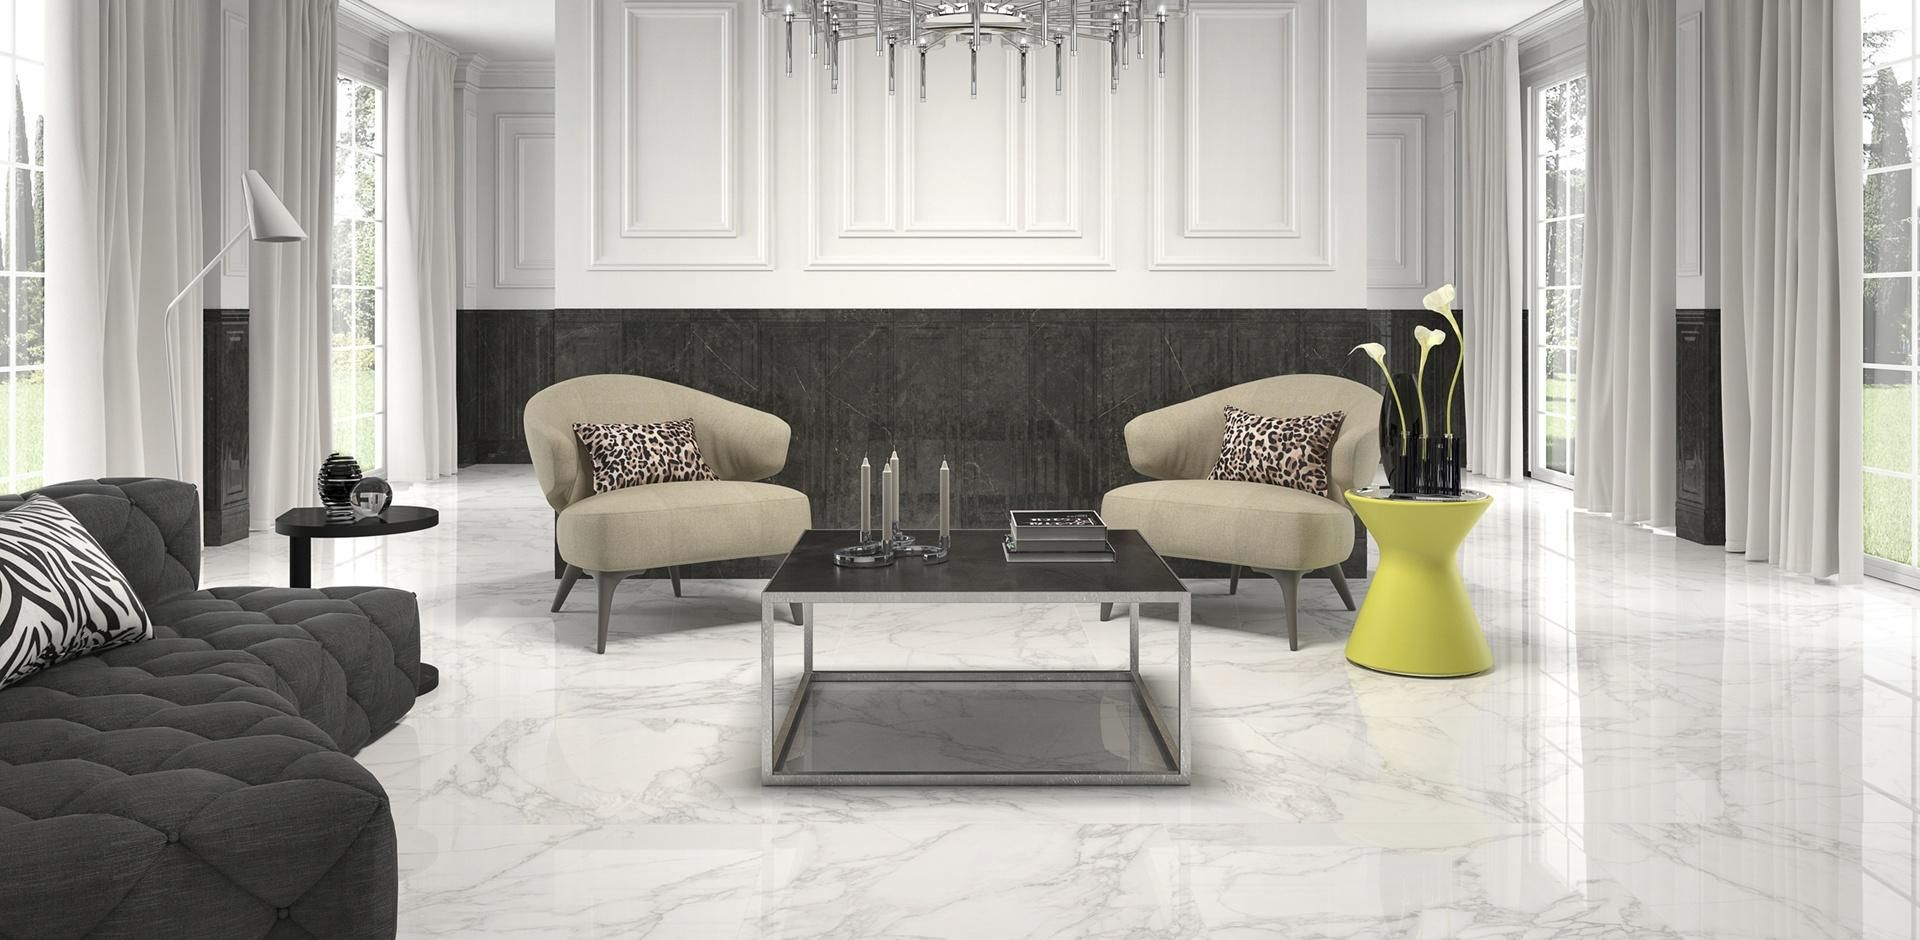 Crystal white 24x24 floor porcelain argenta natural stone crystal white 24x24 floor porcelain argenta dailygadgetfo Gallery